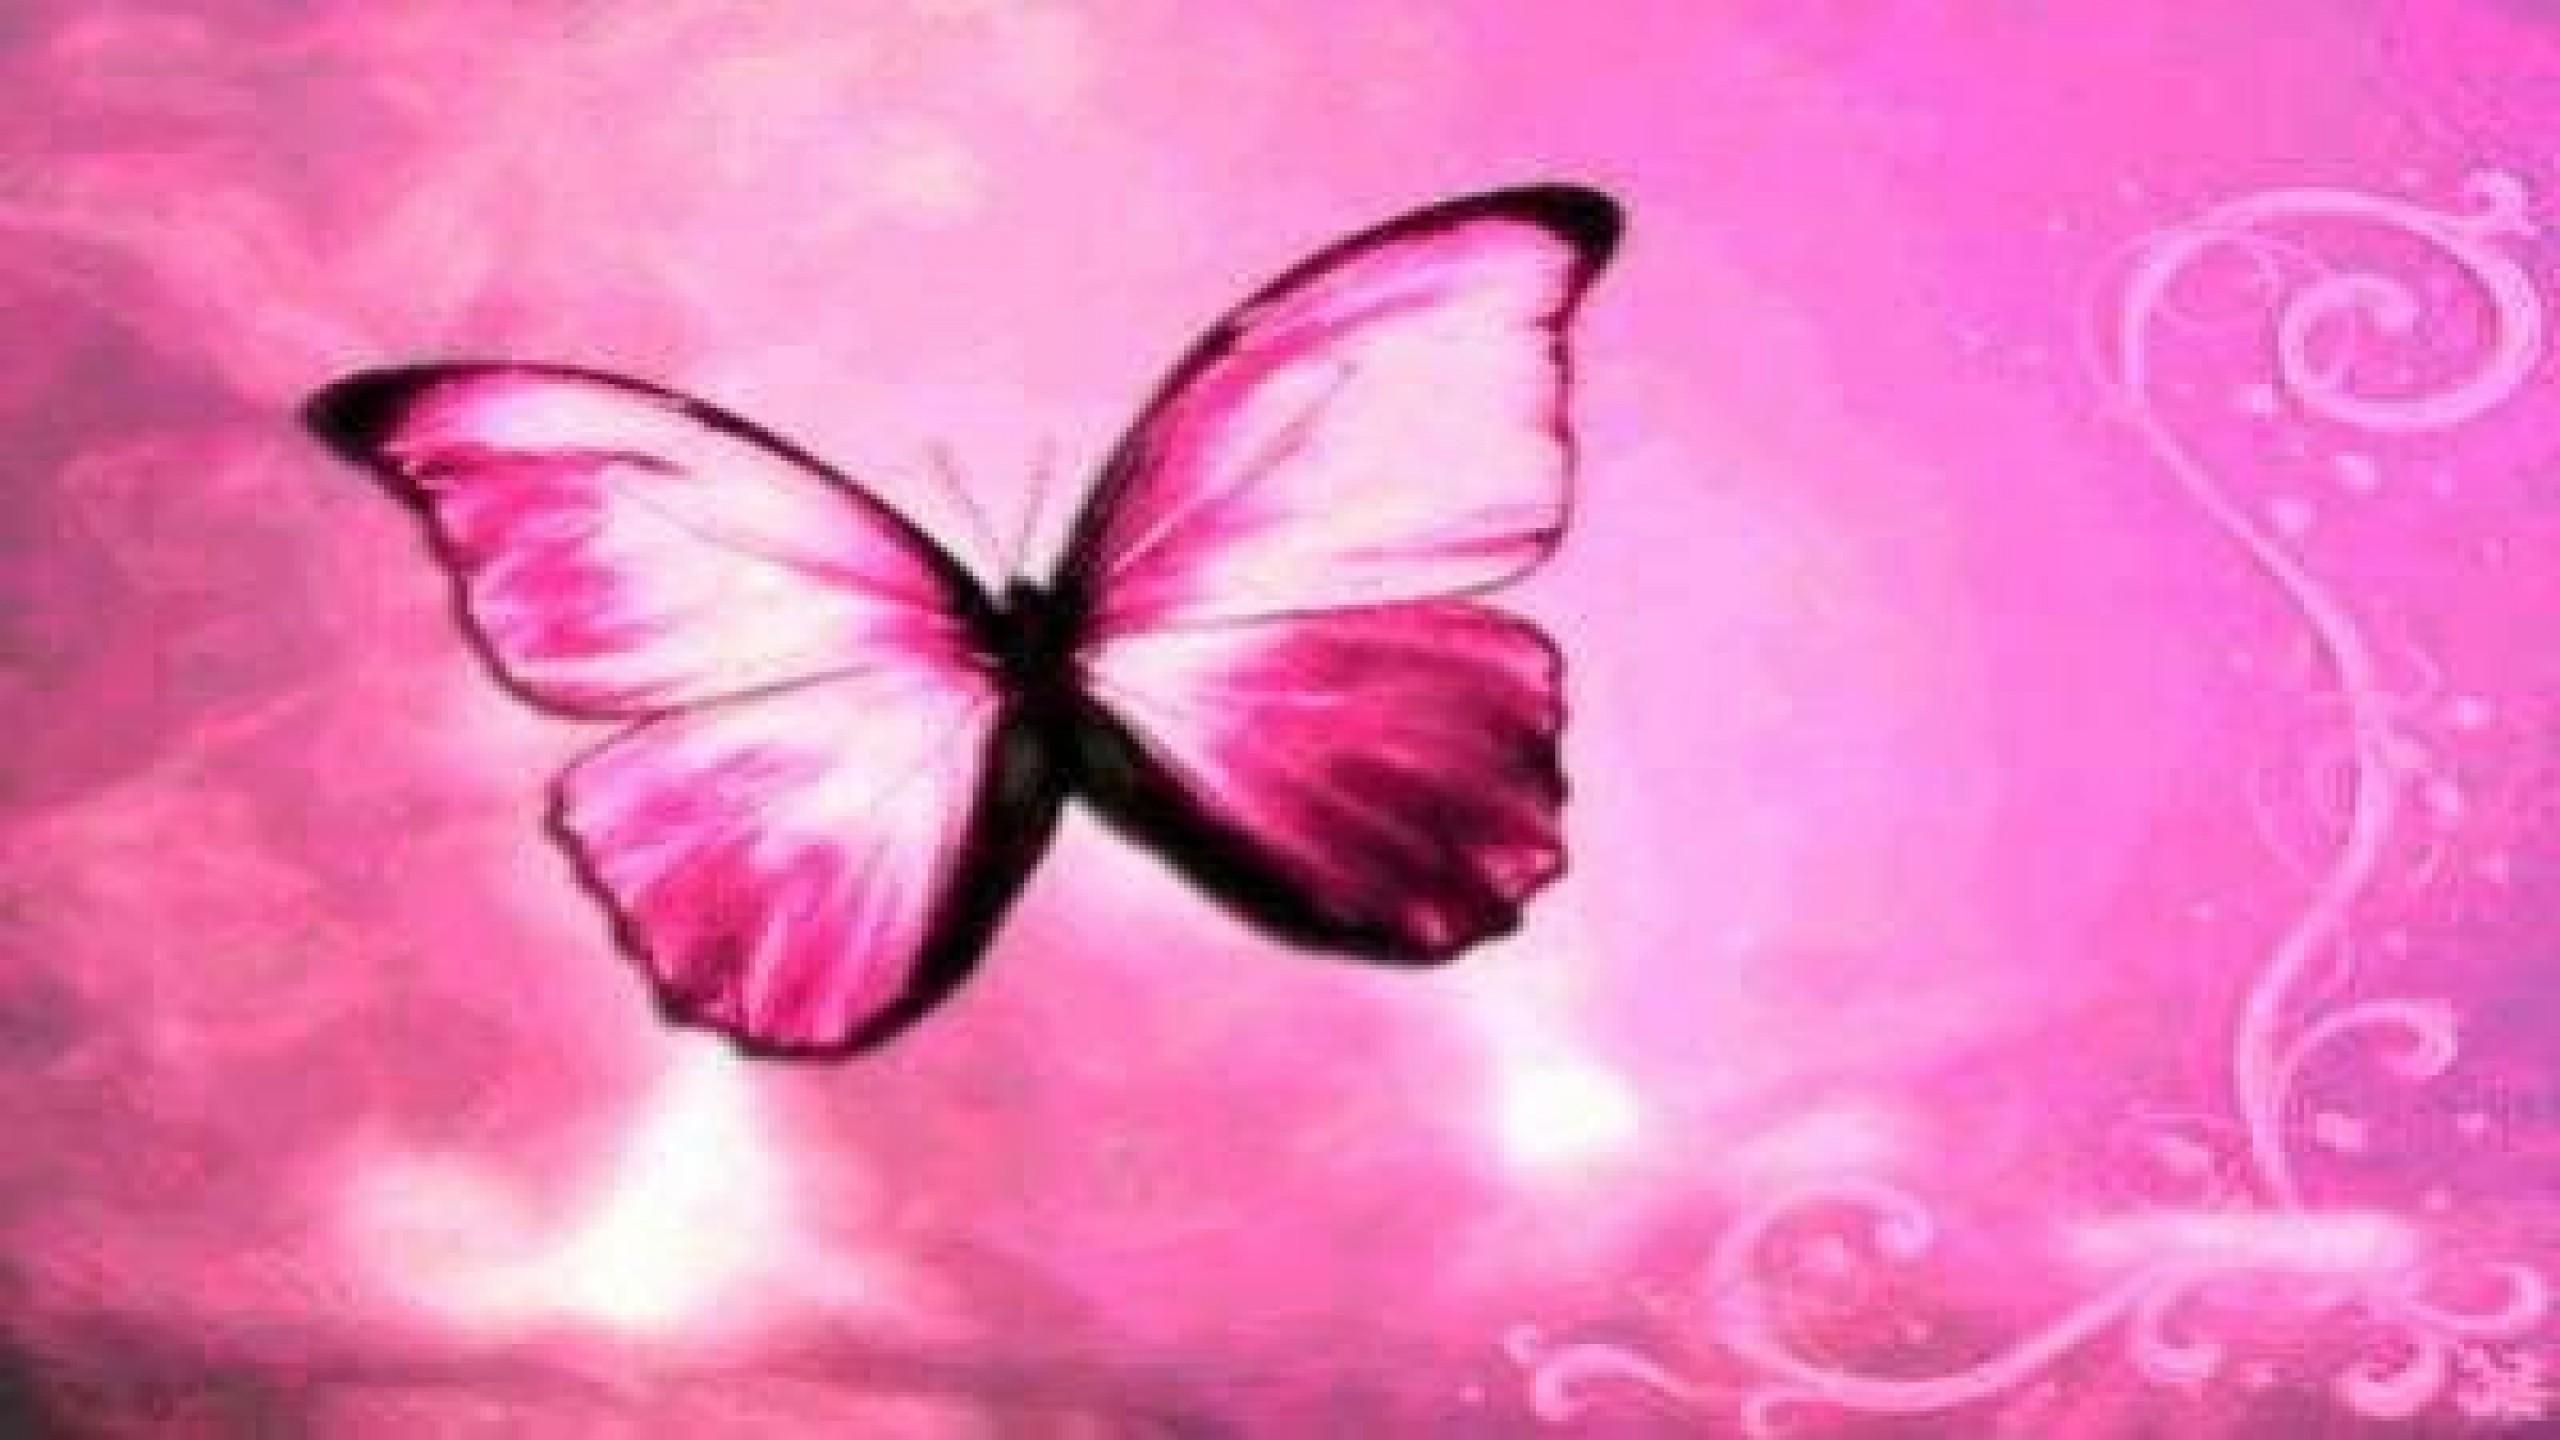 hd cute pink butterfly - photo #11